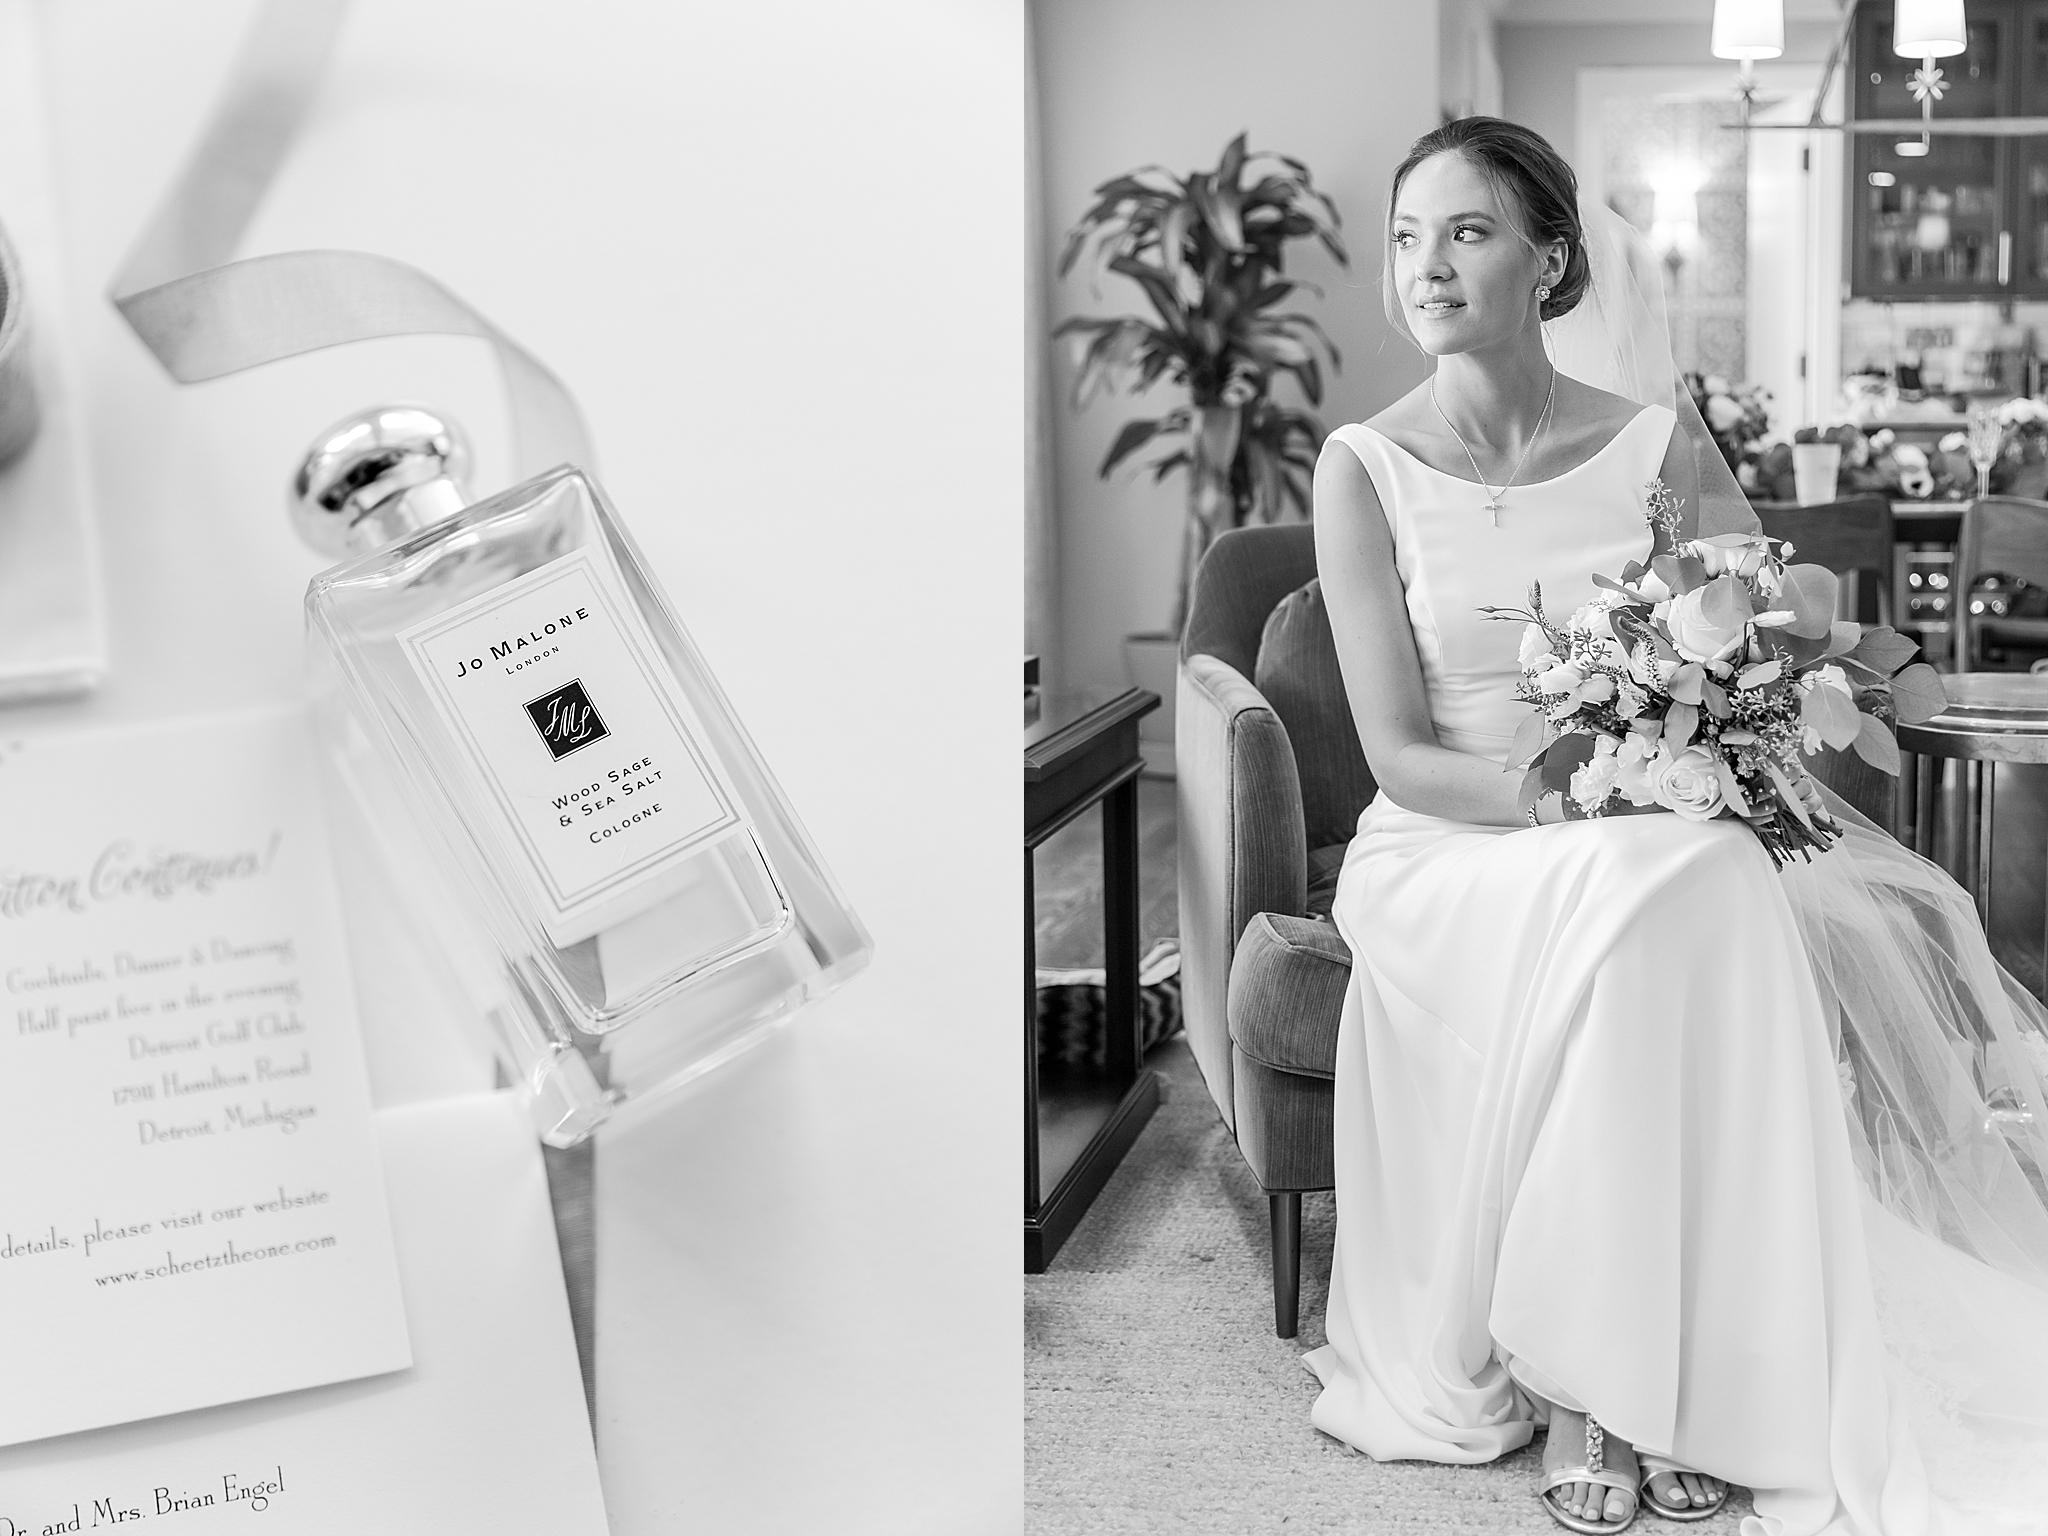 detroit-wedding-photographer-grosse-pointe-academy-chapel-detroit-golf-club-wedding-carly-matt-by-courtney-carolyn-photography_0015.jpg